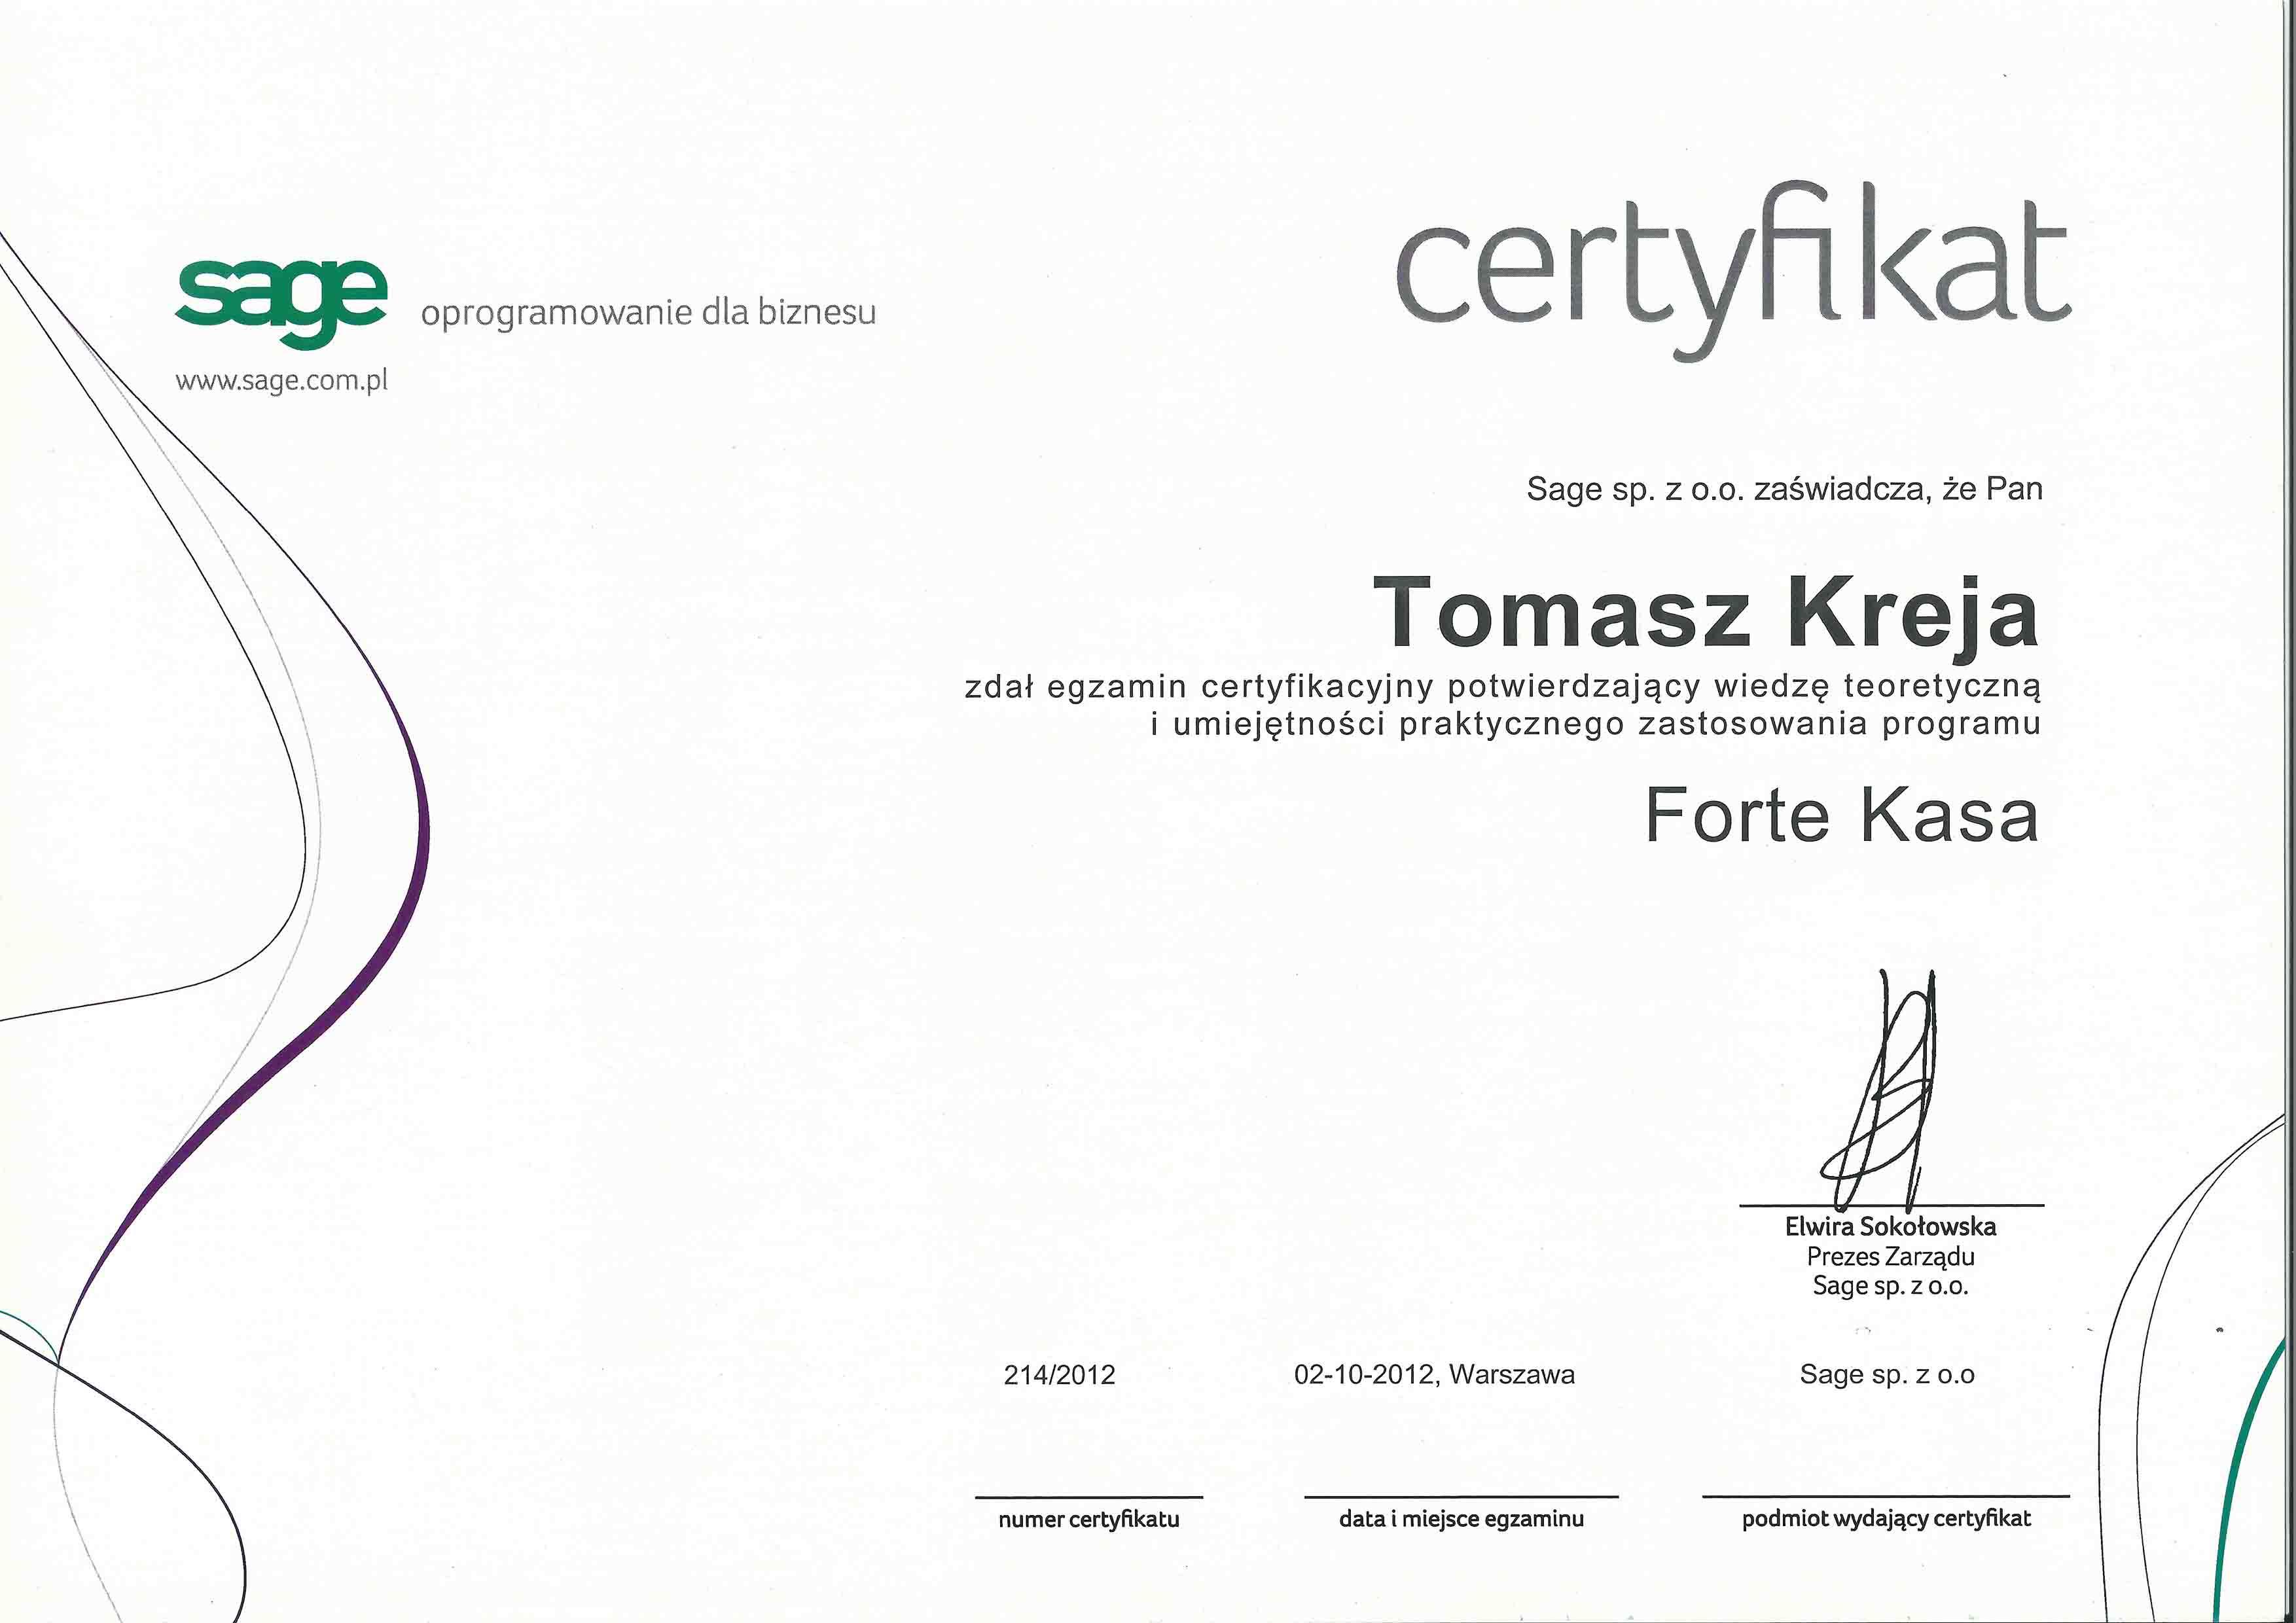 Certfikat_FORTE_Kasa